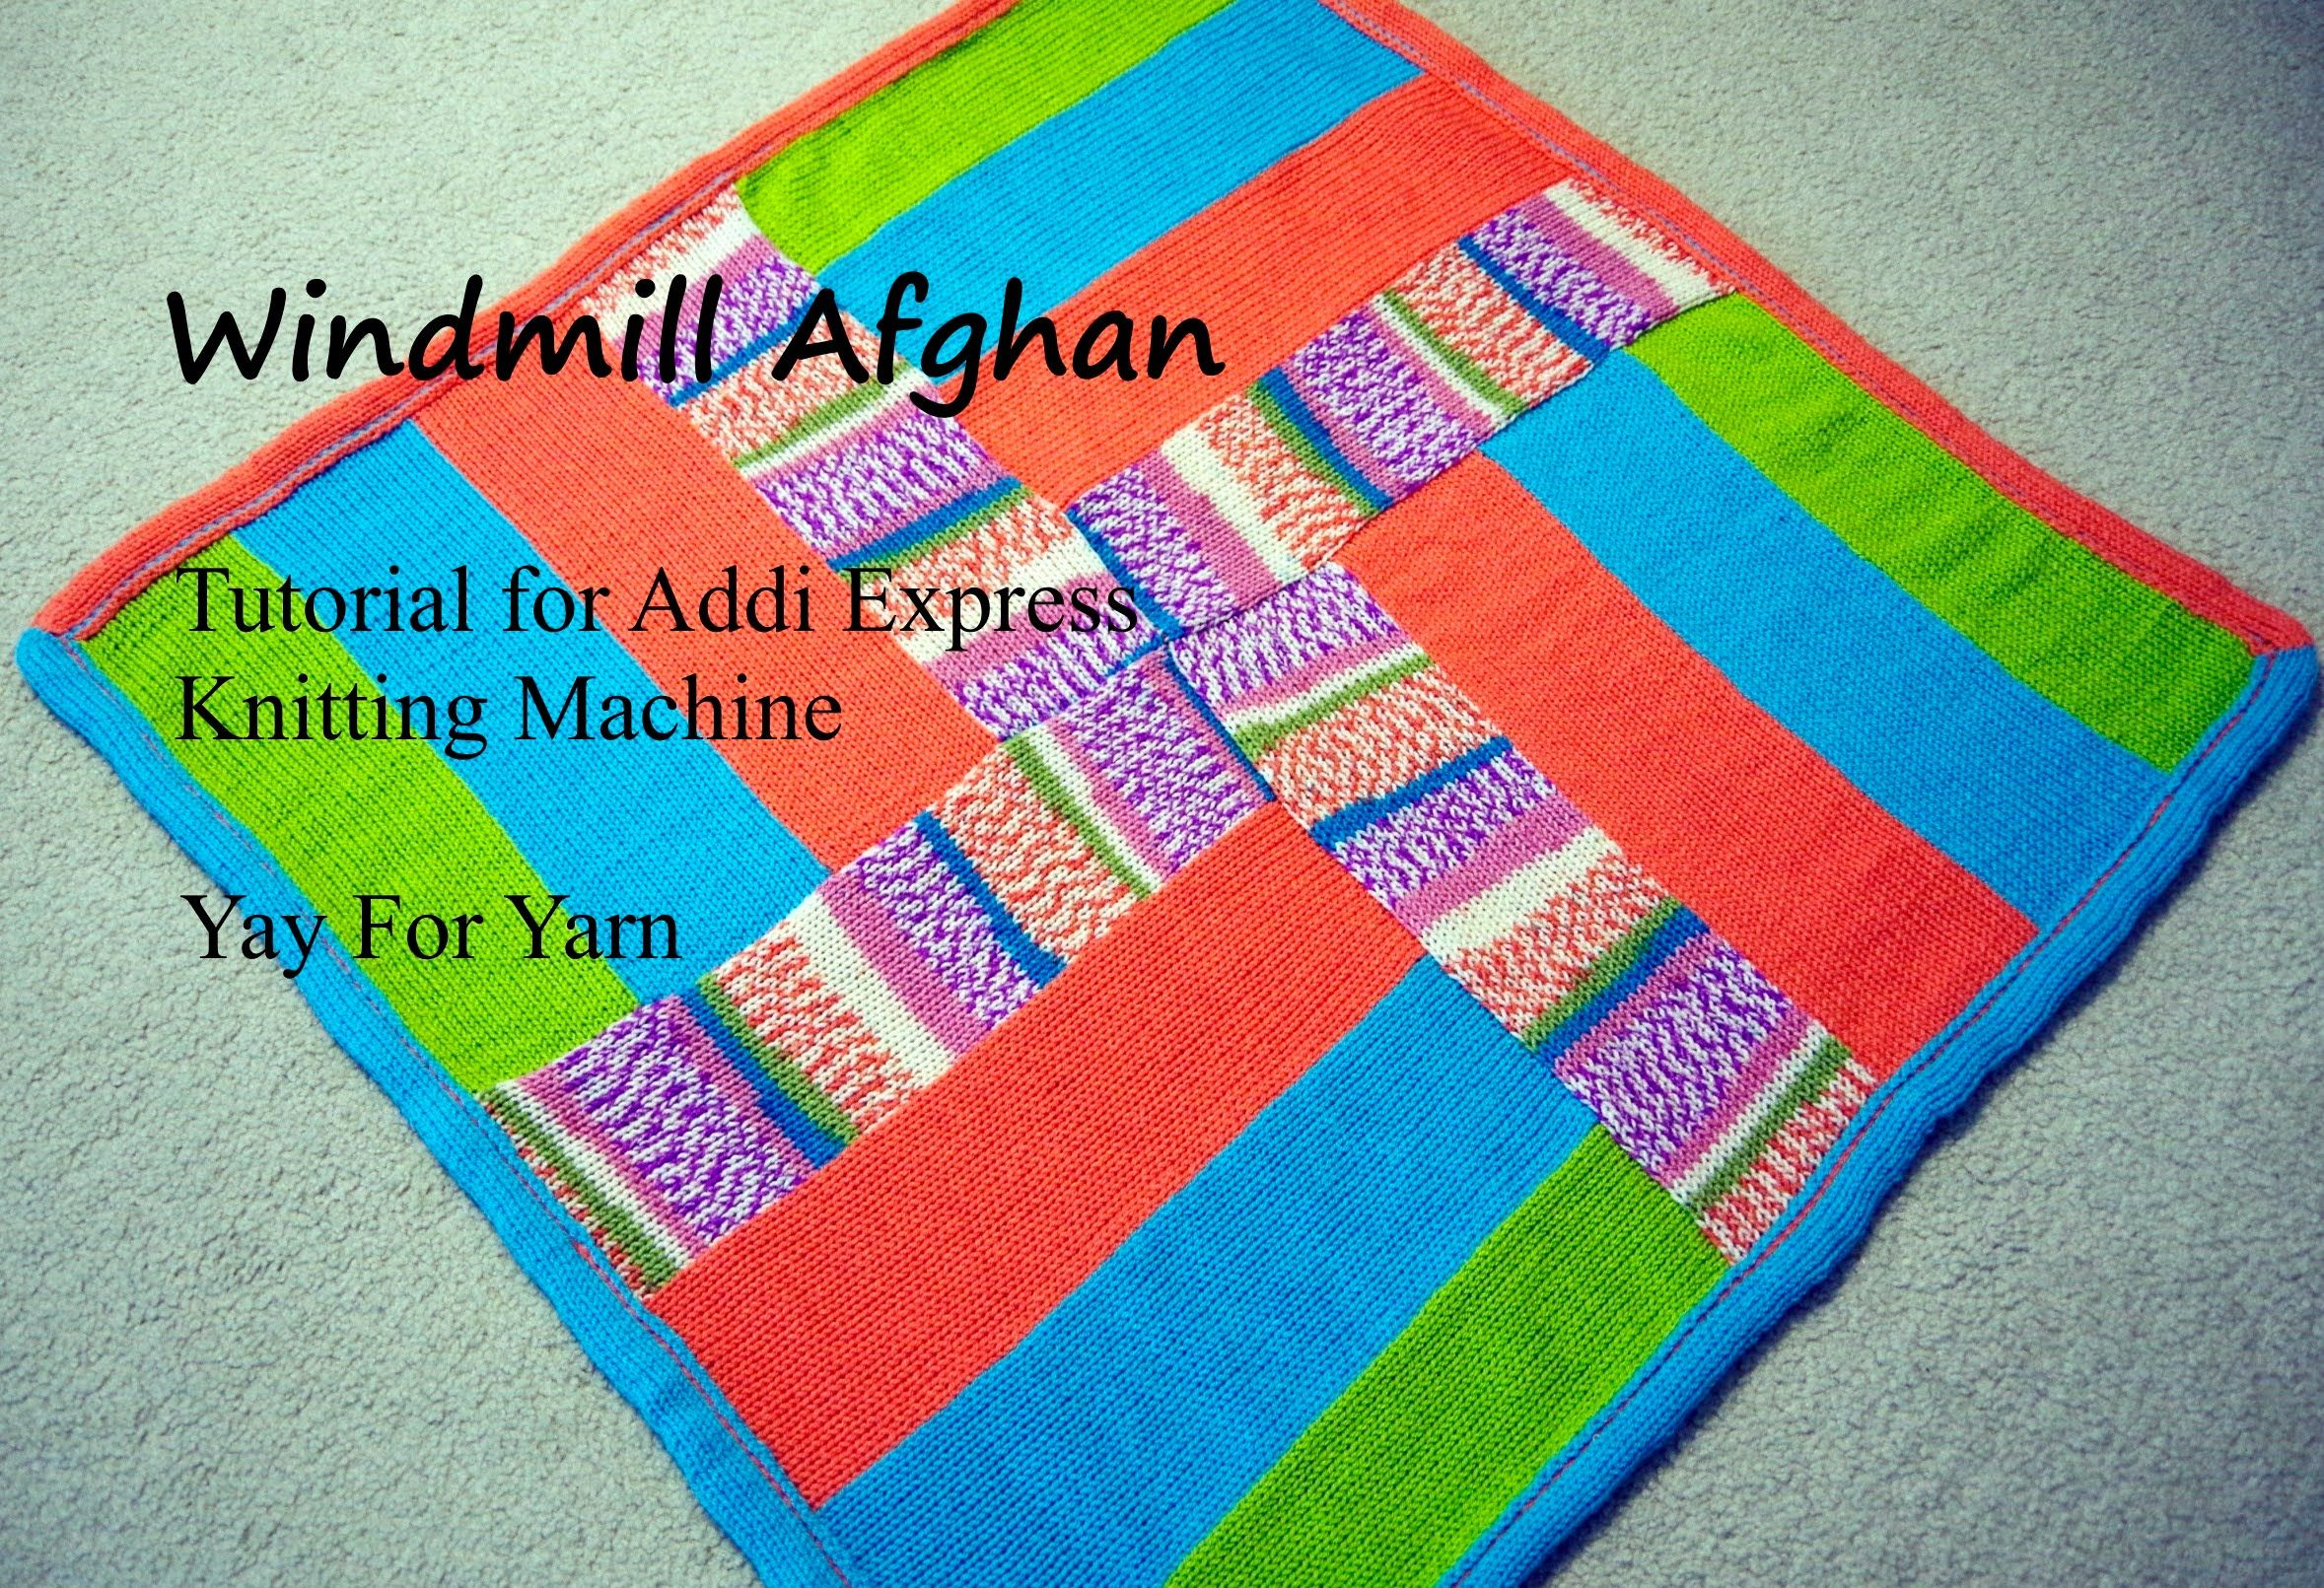 Knitting Machine Tutorial : Windmill afghan tutorial for addi express knitting